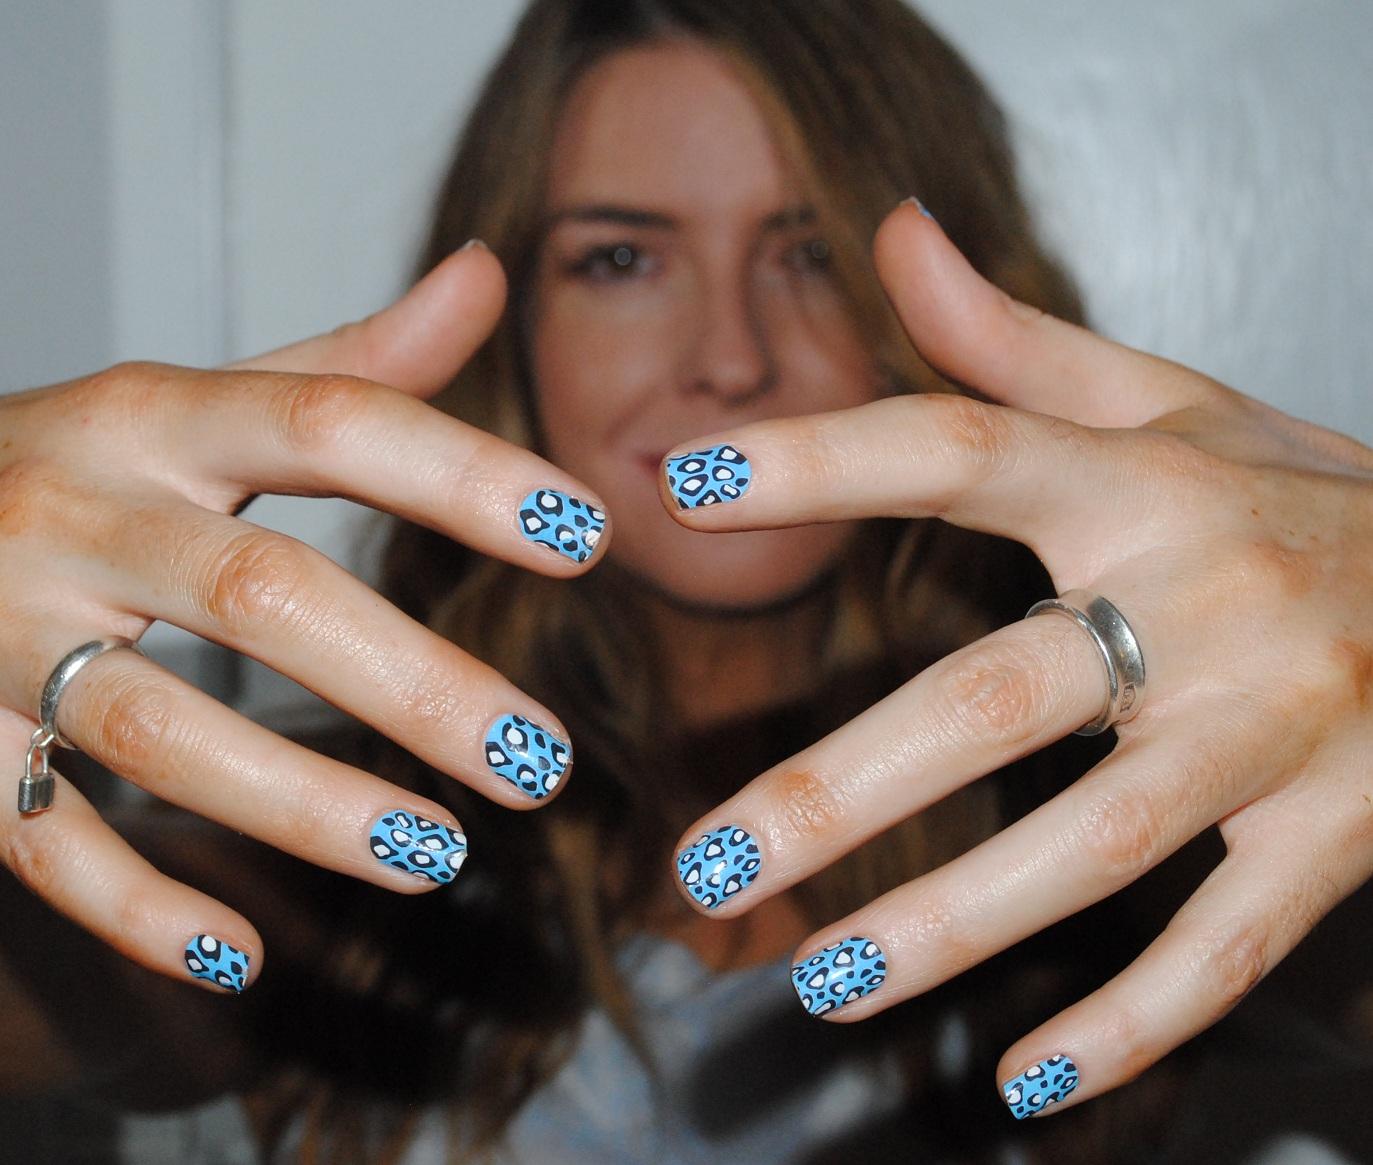 http://2.bp.blogspot.com/-VnQMHjhzlxk/UCyKy7kjP5I/AAAAAAAAExE/cZ4TKhDmTho/s1600/Models_own_nail_wraps_blue_leopard.jpg